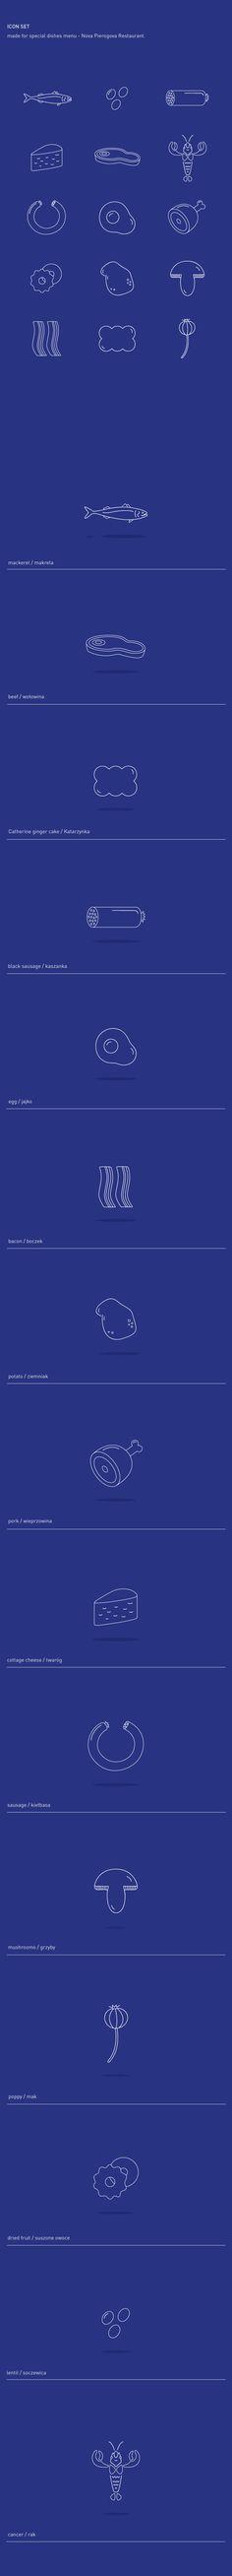 Icon Set - restaurant menu by Aga Borzyszkowska, via Behance